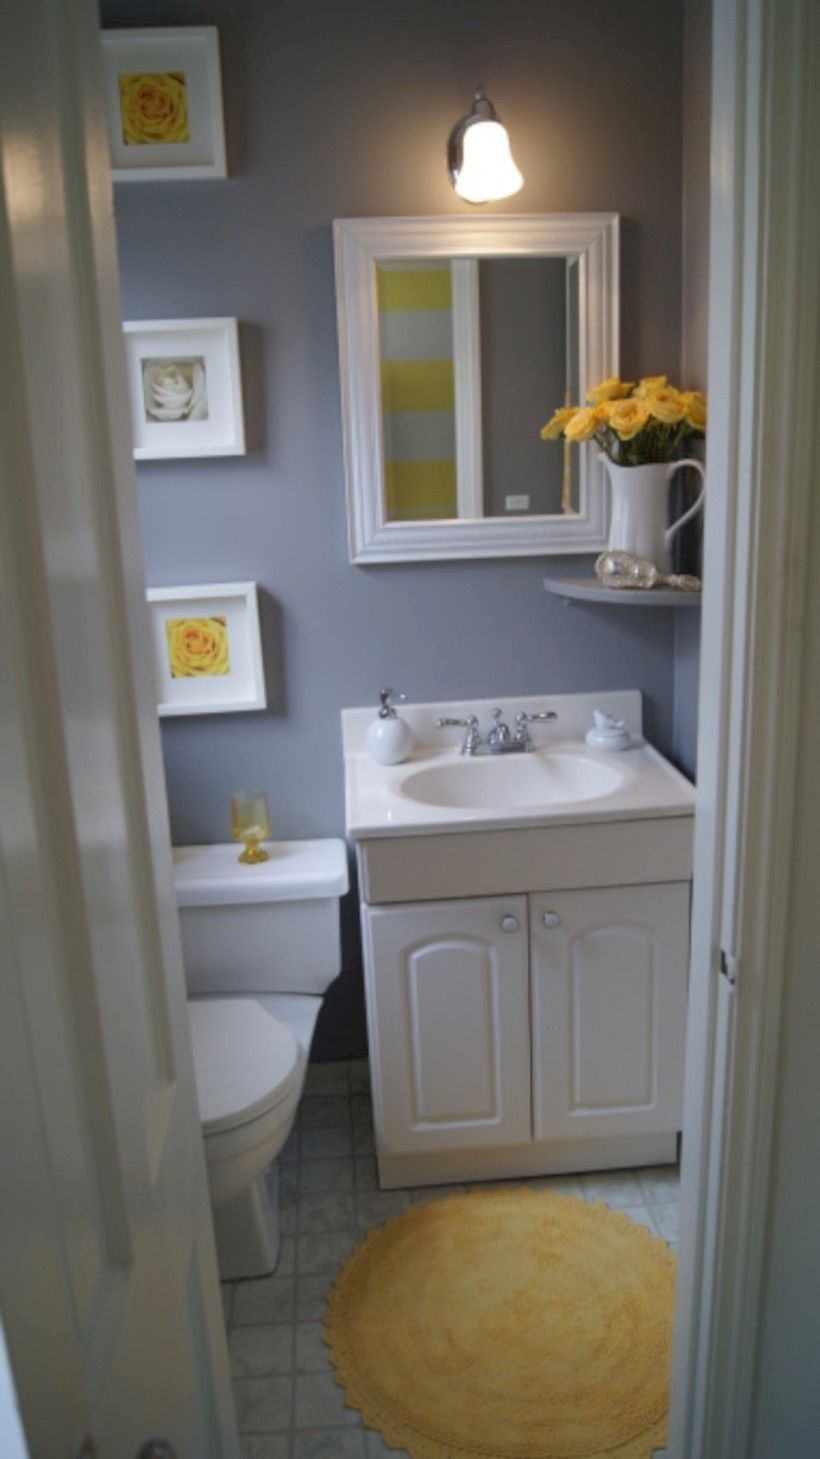 55 Incredible Half Bathroom Decor Ideas Home Decor Ideas Gray Bathroom Decor Small Grey Bathrooms Half Bathroom Decor